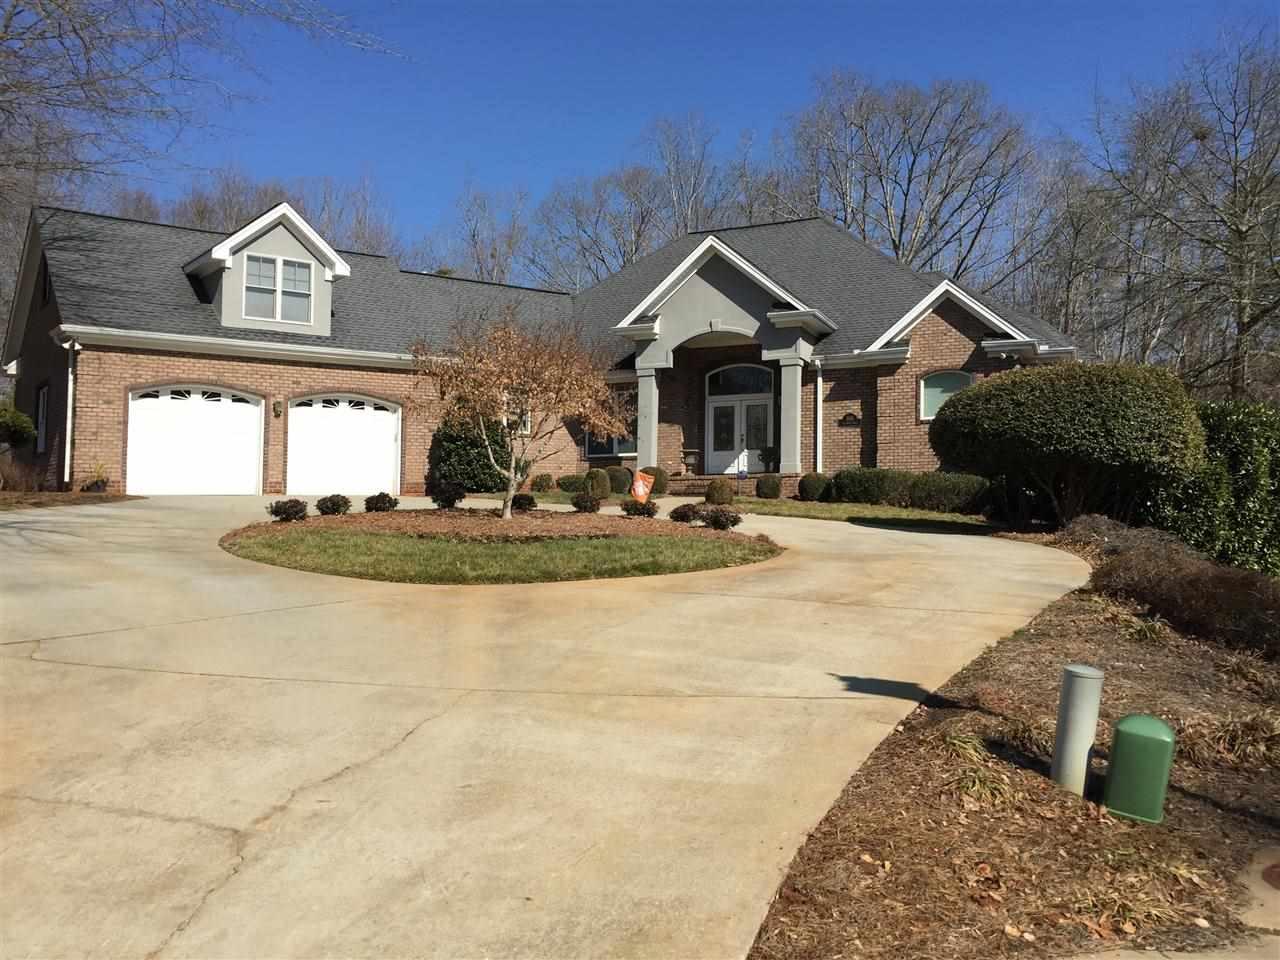 Real Estate for Sale, ListingId: 31949771, Clemson,SC29631